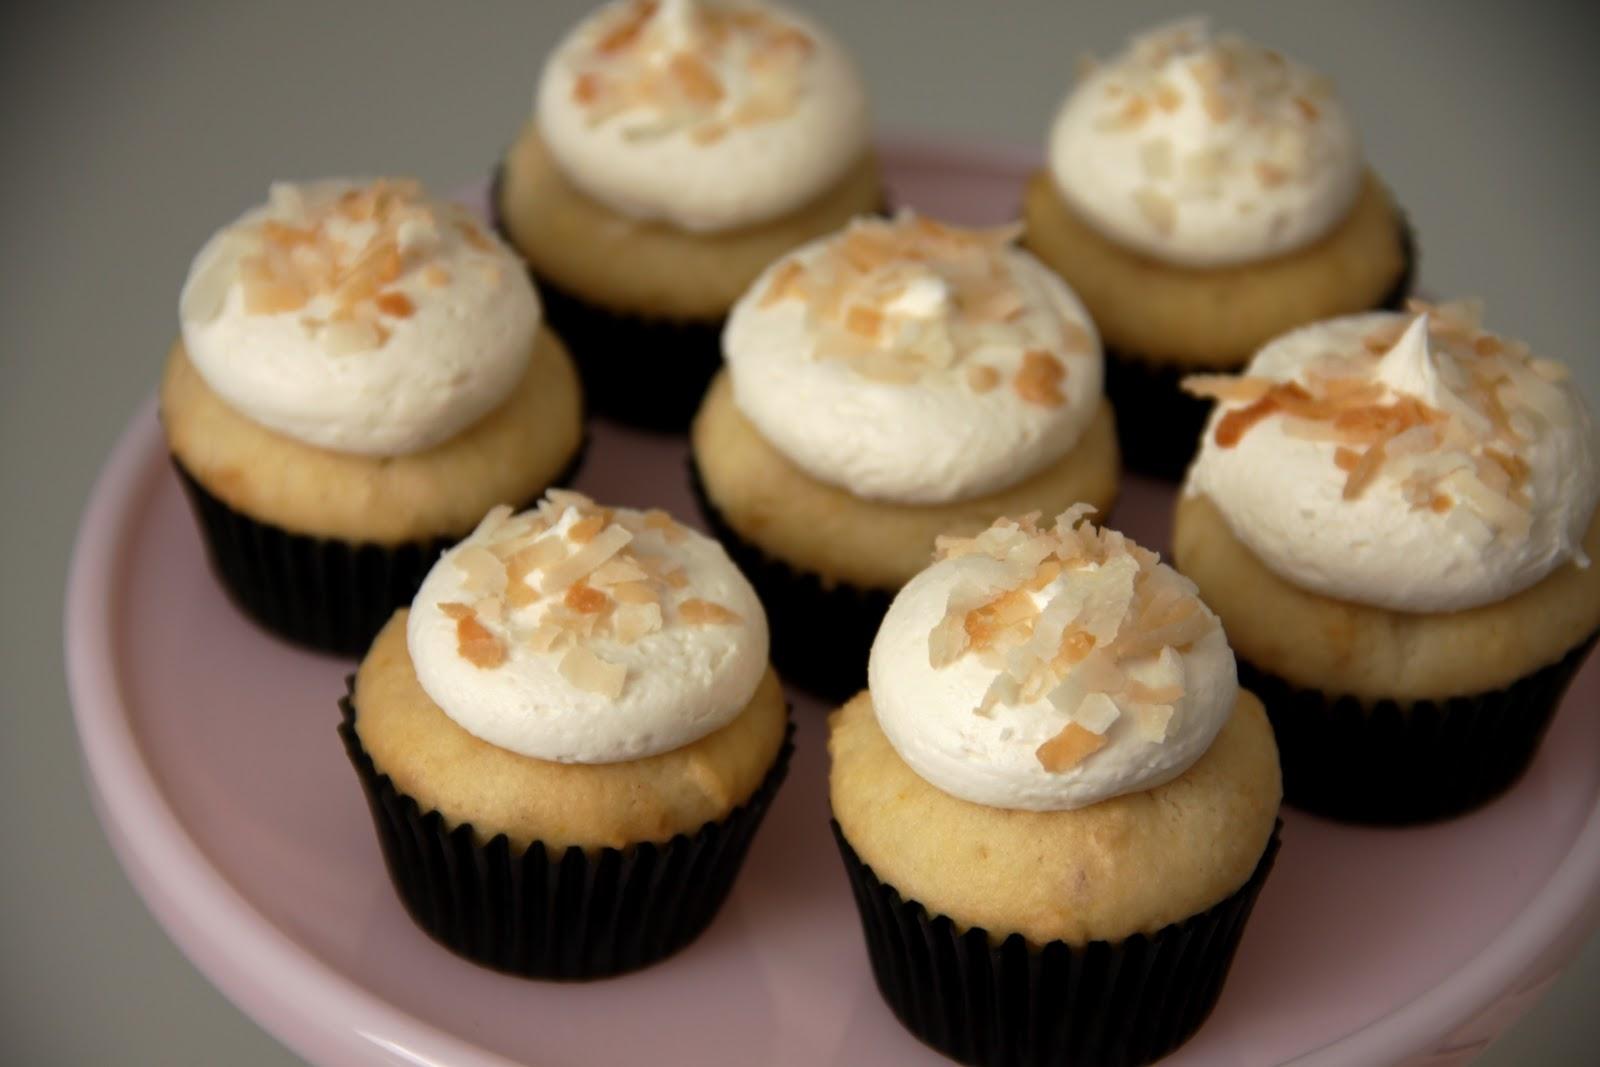 7 Photos of White Chocolate Macadamia Cupcakes